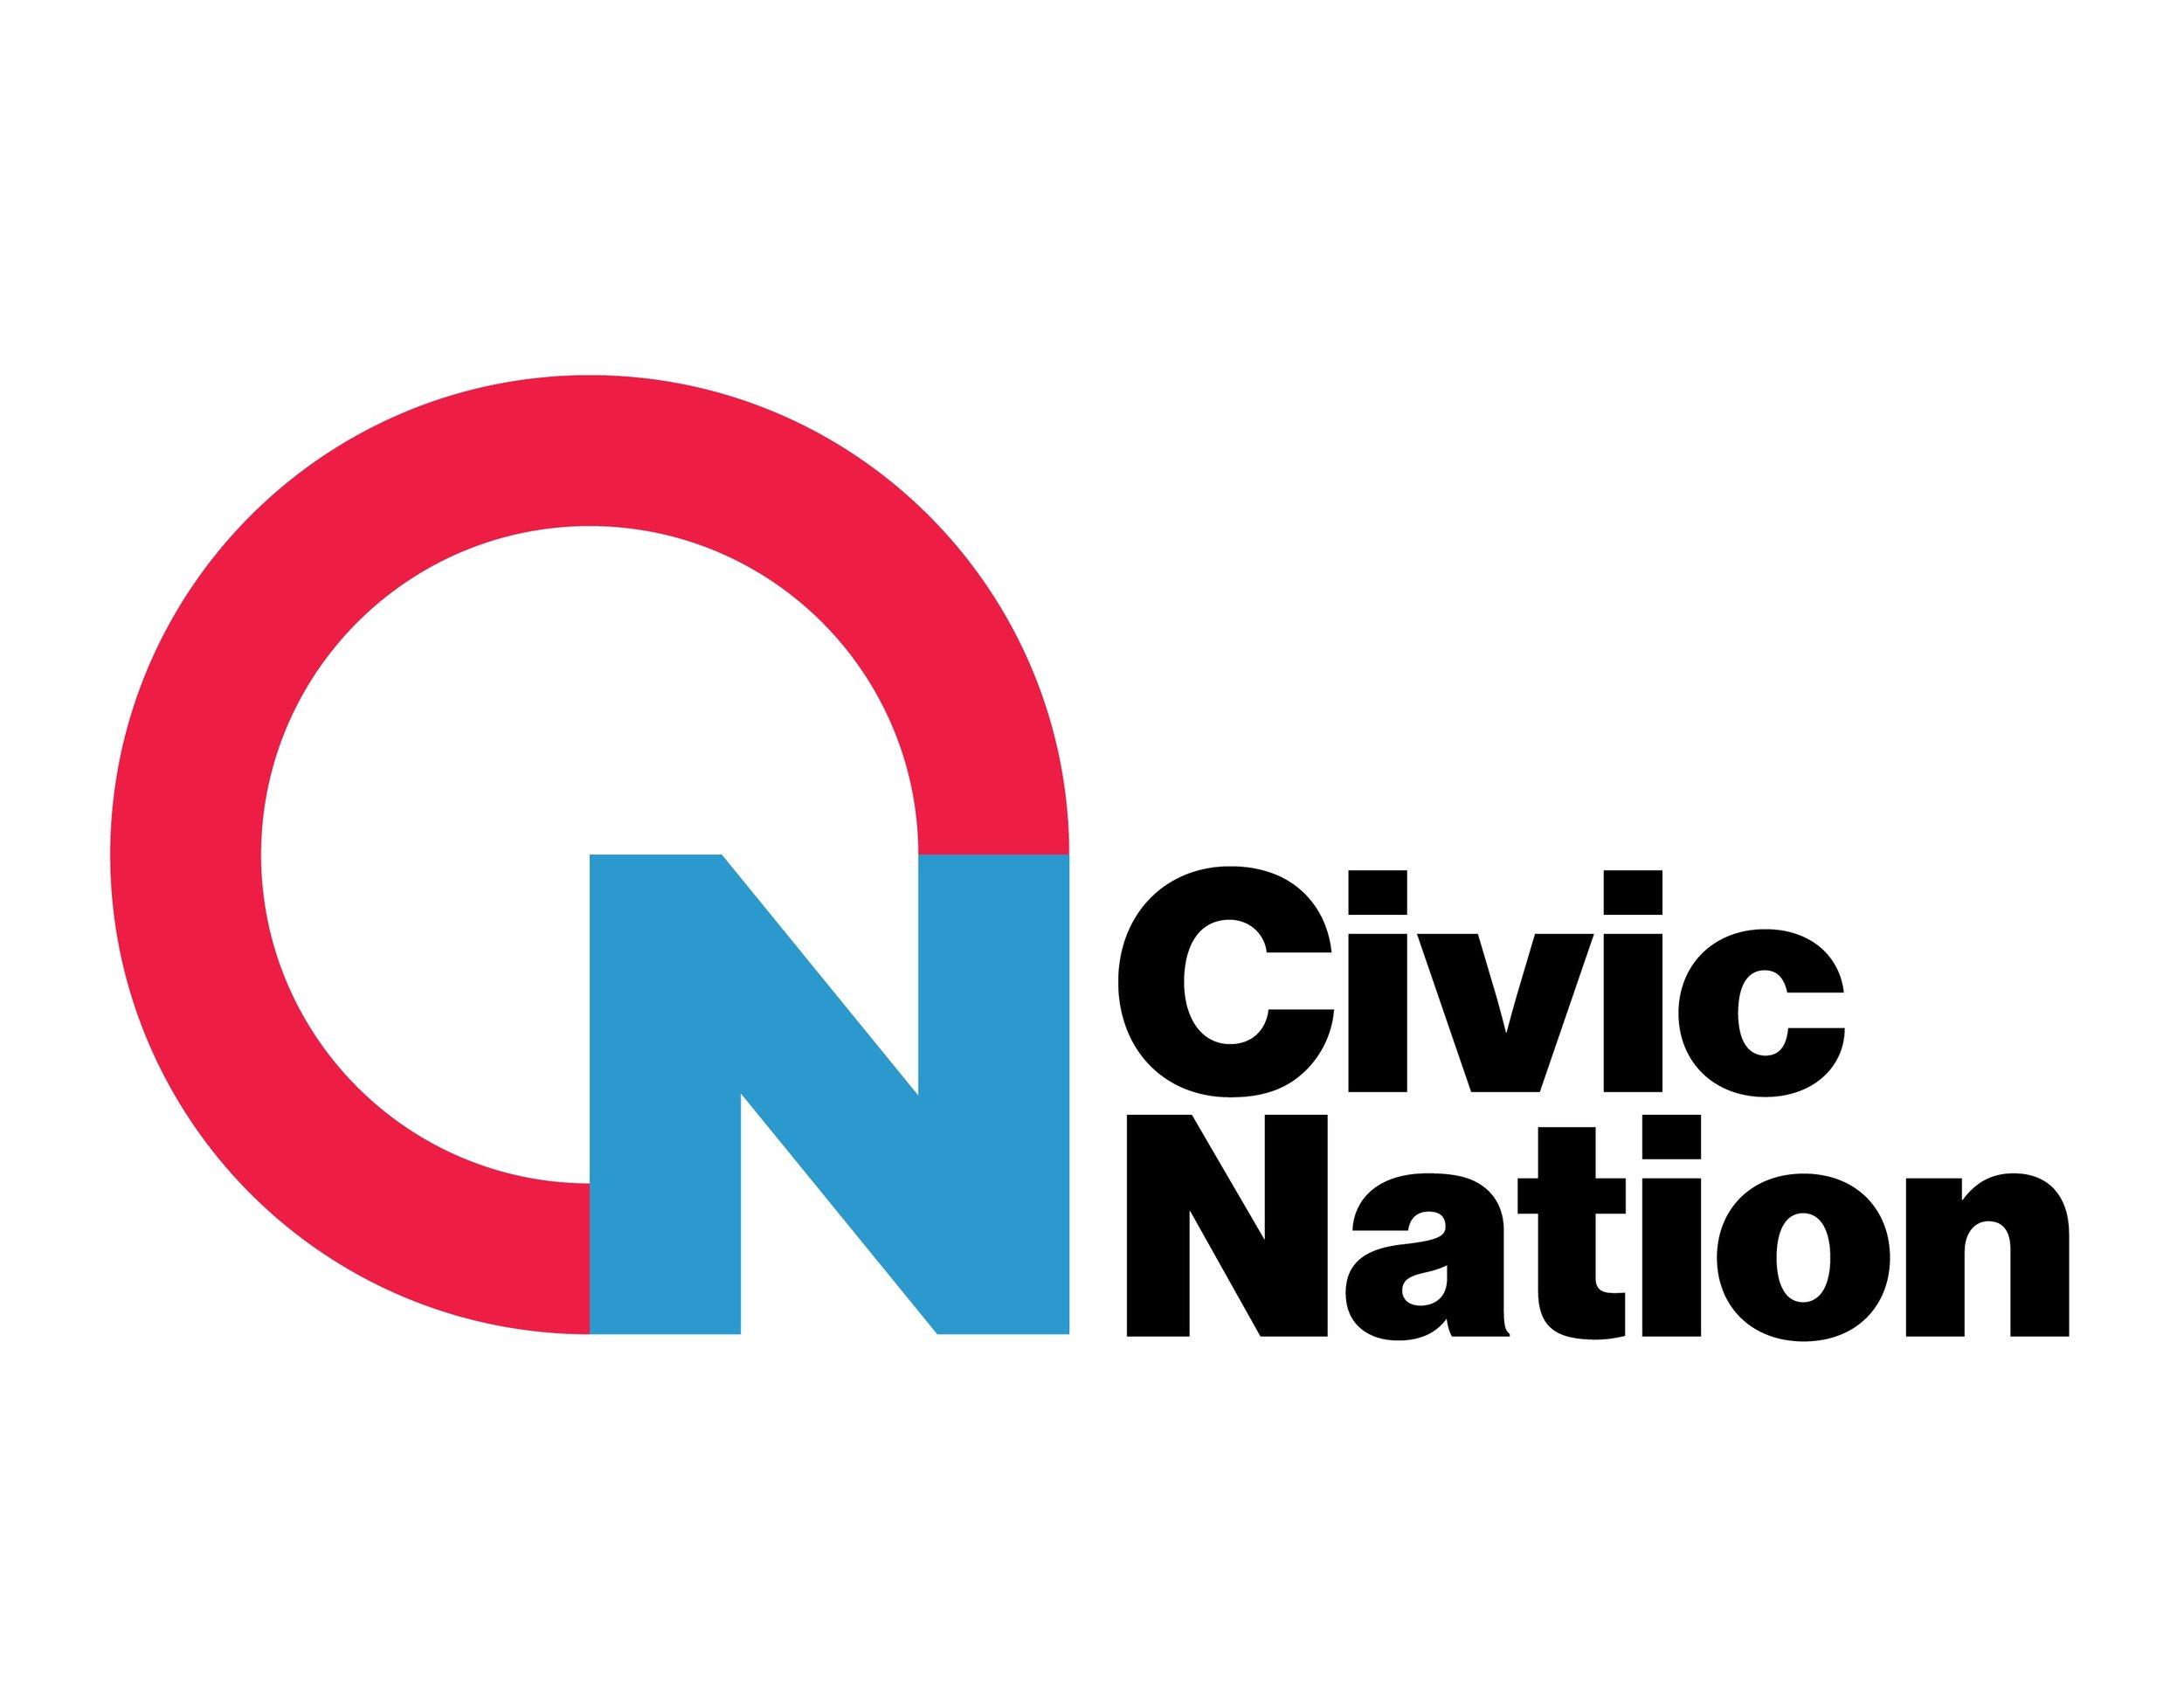 civic-nation_original_logo.jpg